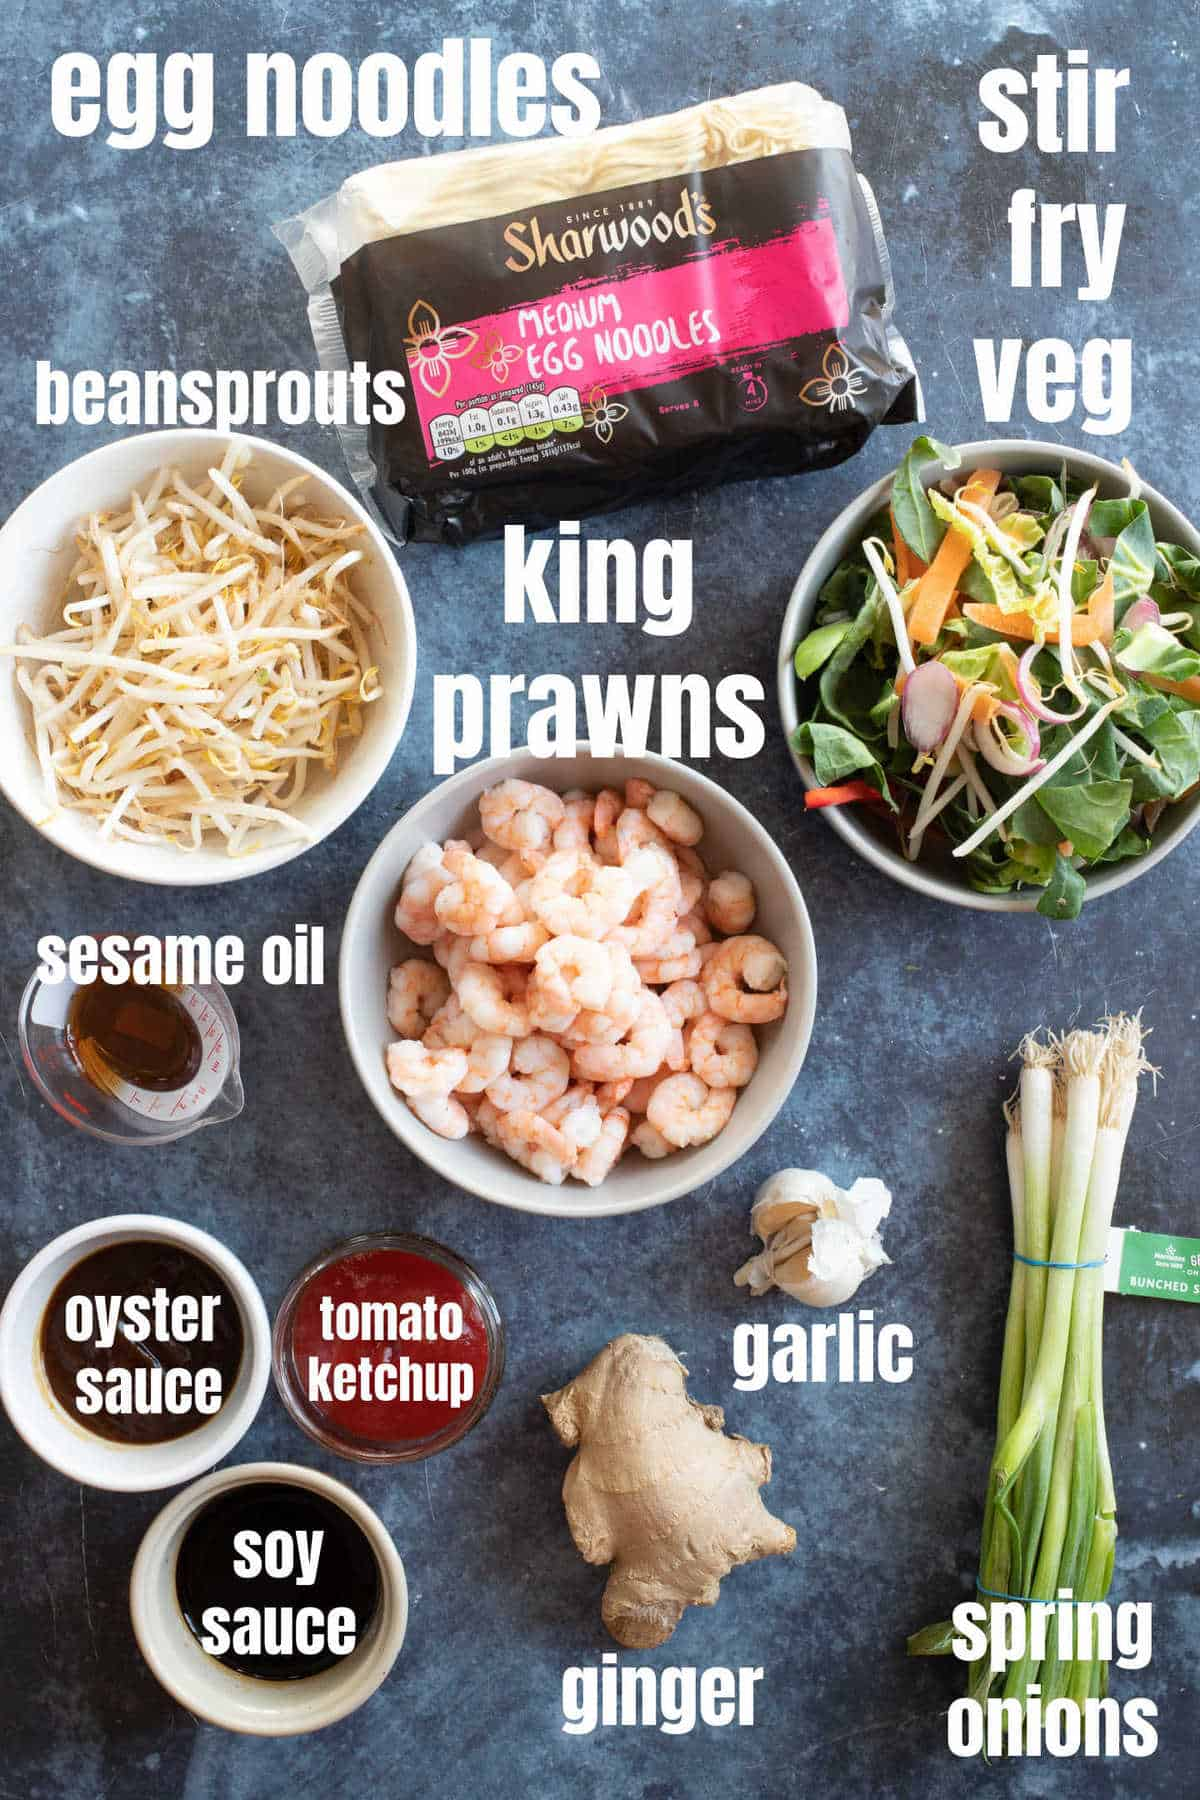 Ingredients for making prawn chow mein.